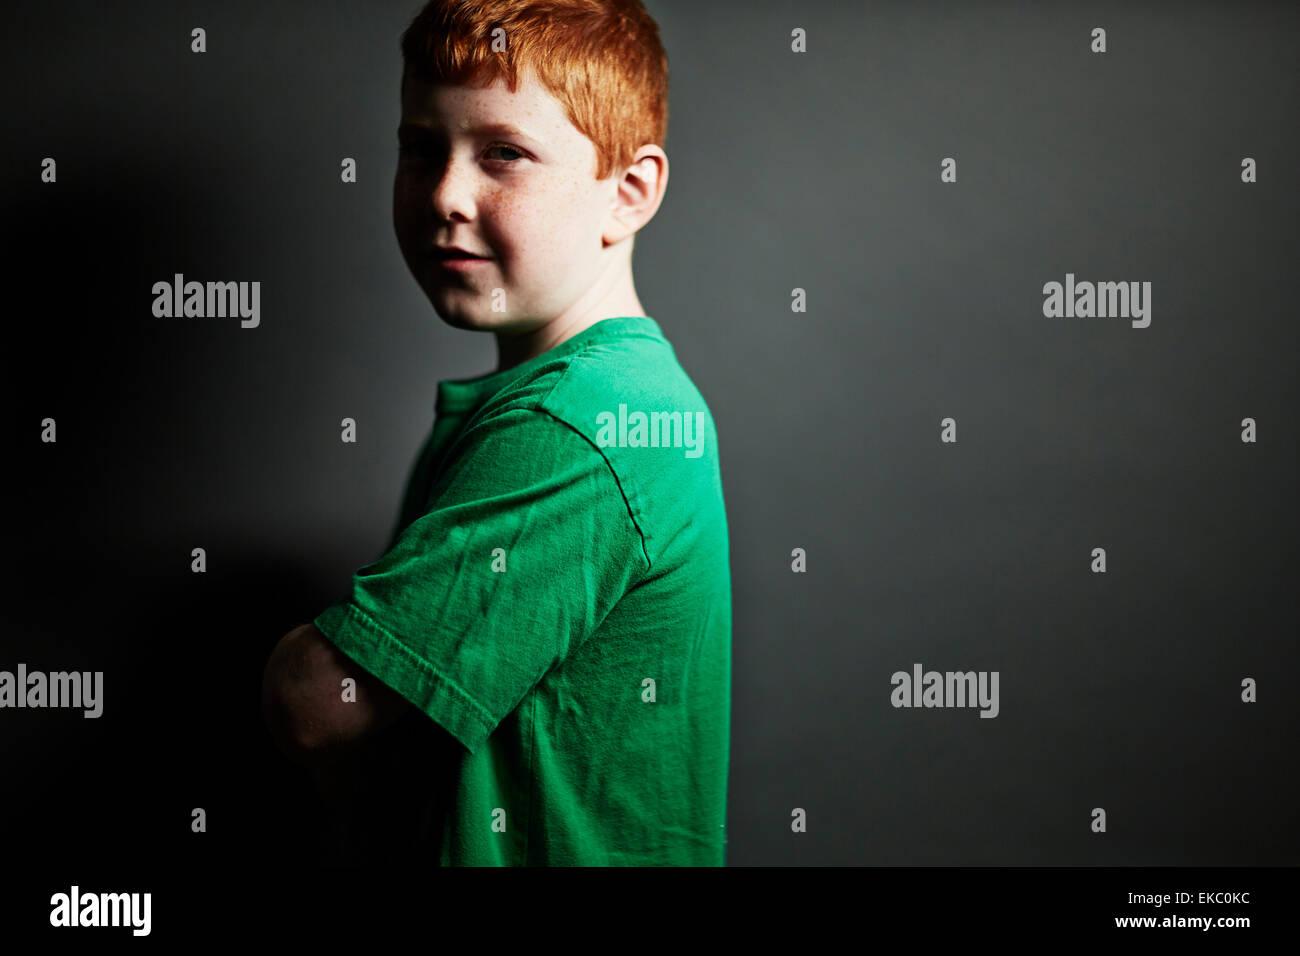 Boy wearing green t shirt - Stock Image